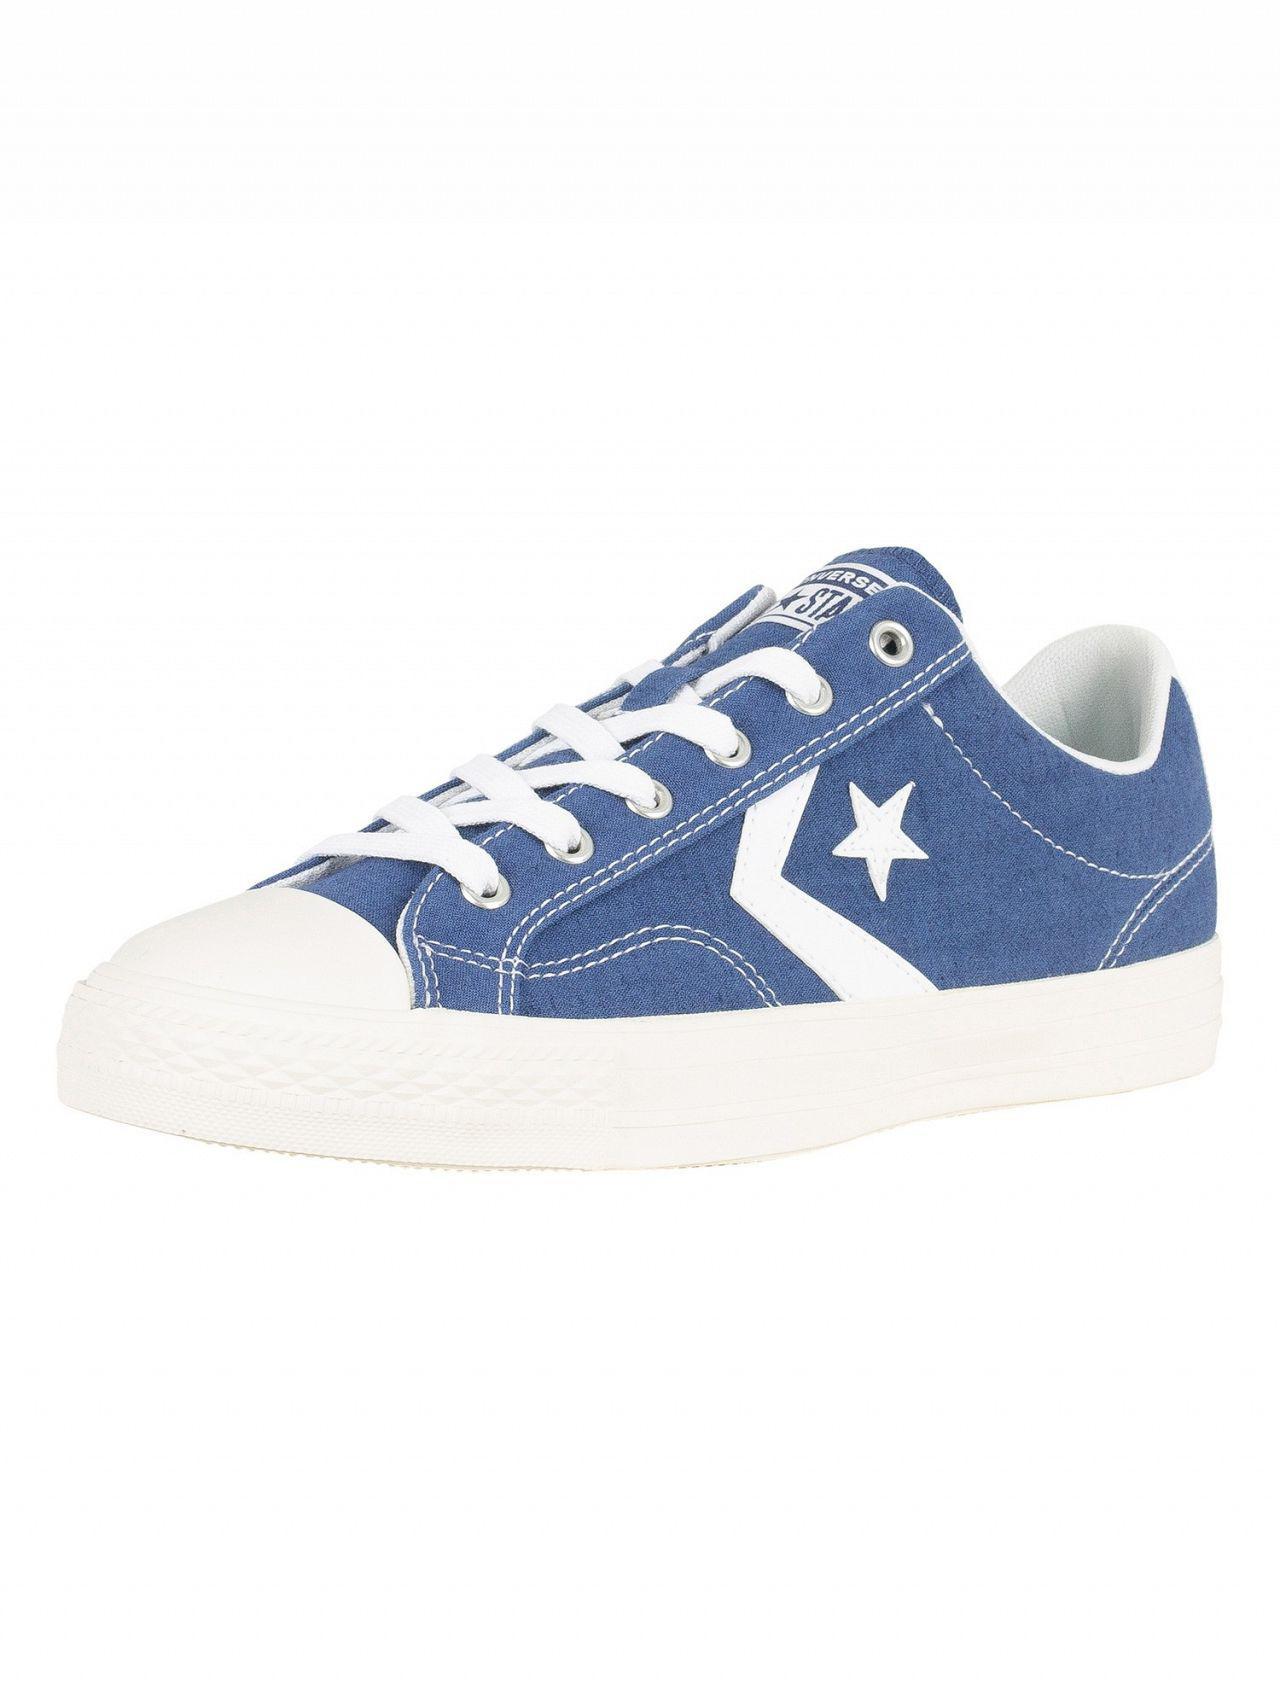 0283164ef98 ... usa converse. mens mason blue white star player ox canvas trainers  359e6 afa1d